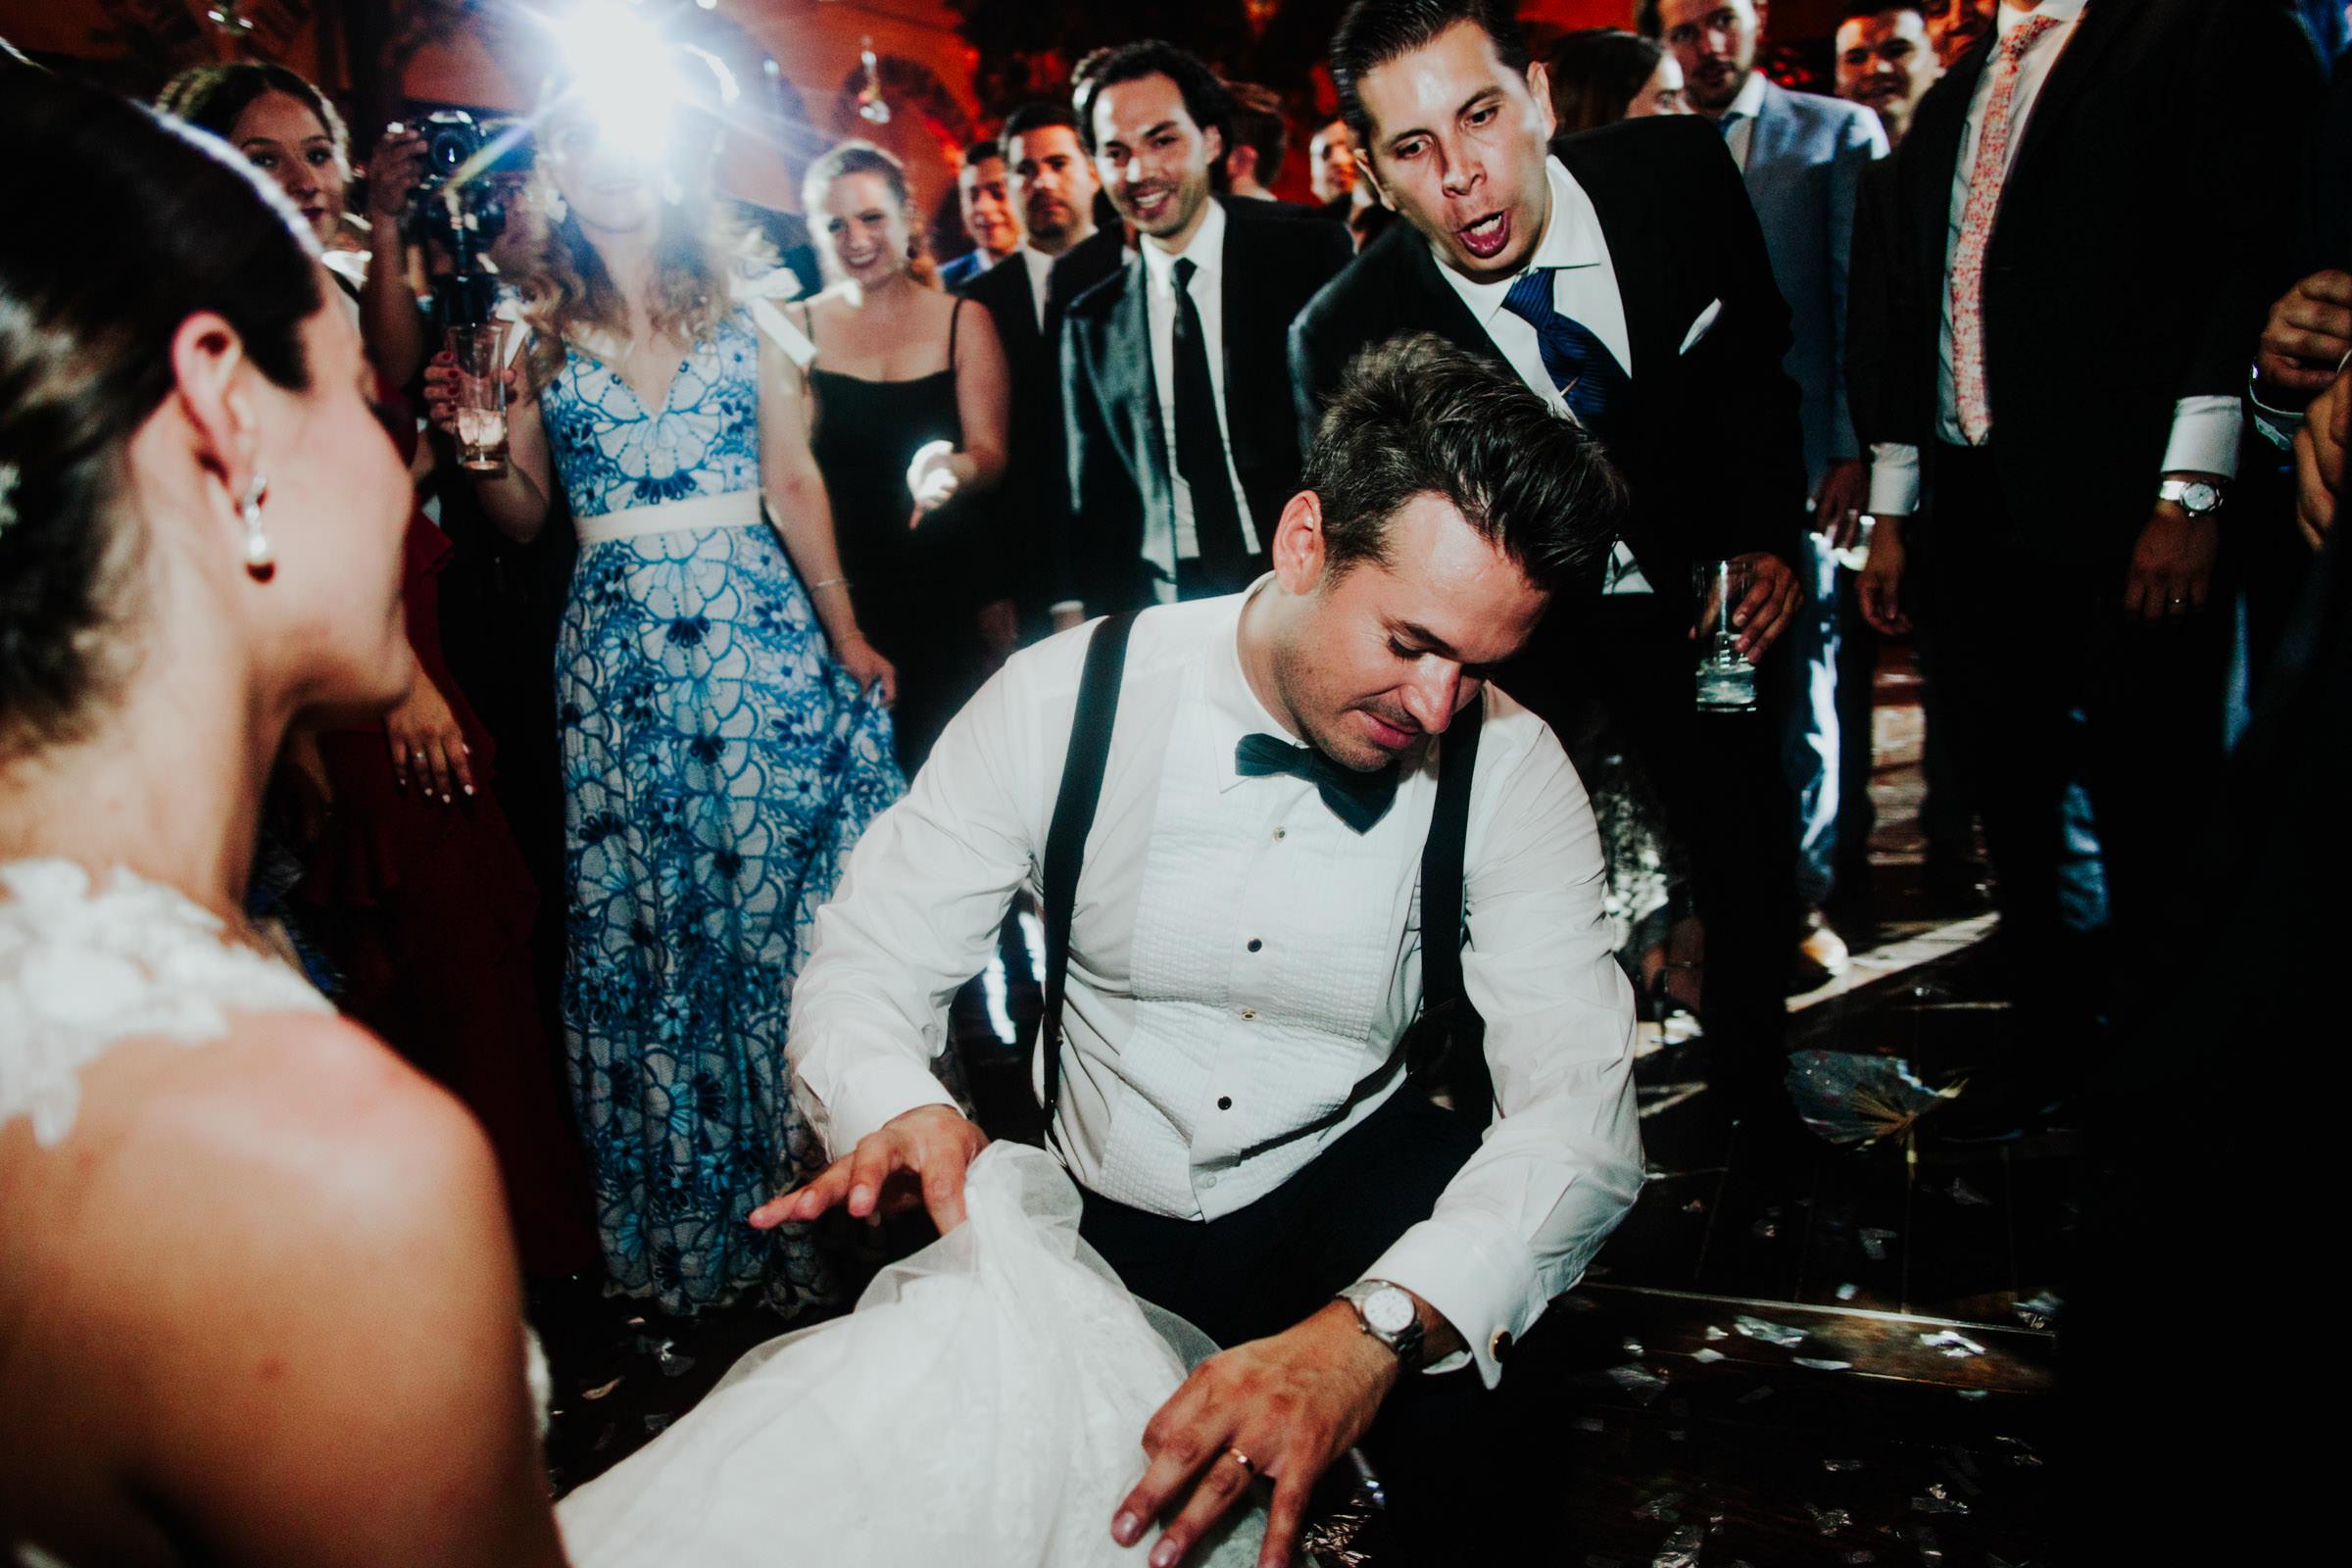 San-Miguel-de-Allende-Wedding-Photography-Parroquia-Instituto-Boda-Fotografia-Fer-Sergio-Pierce-Lifestyle-Photography0086.JPG